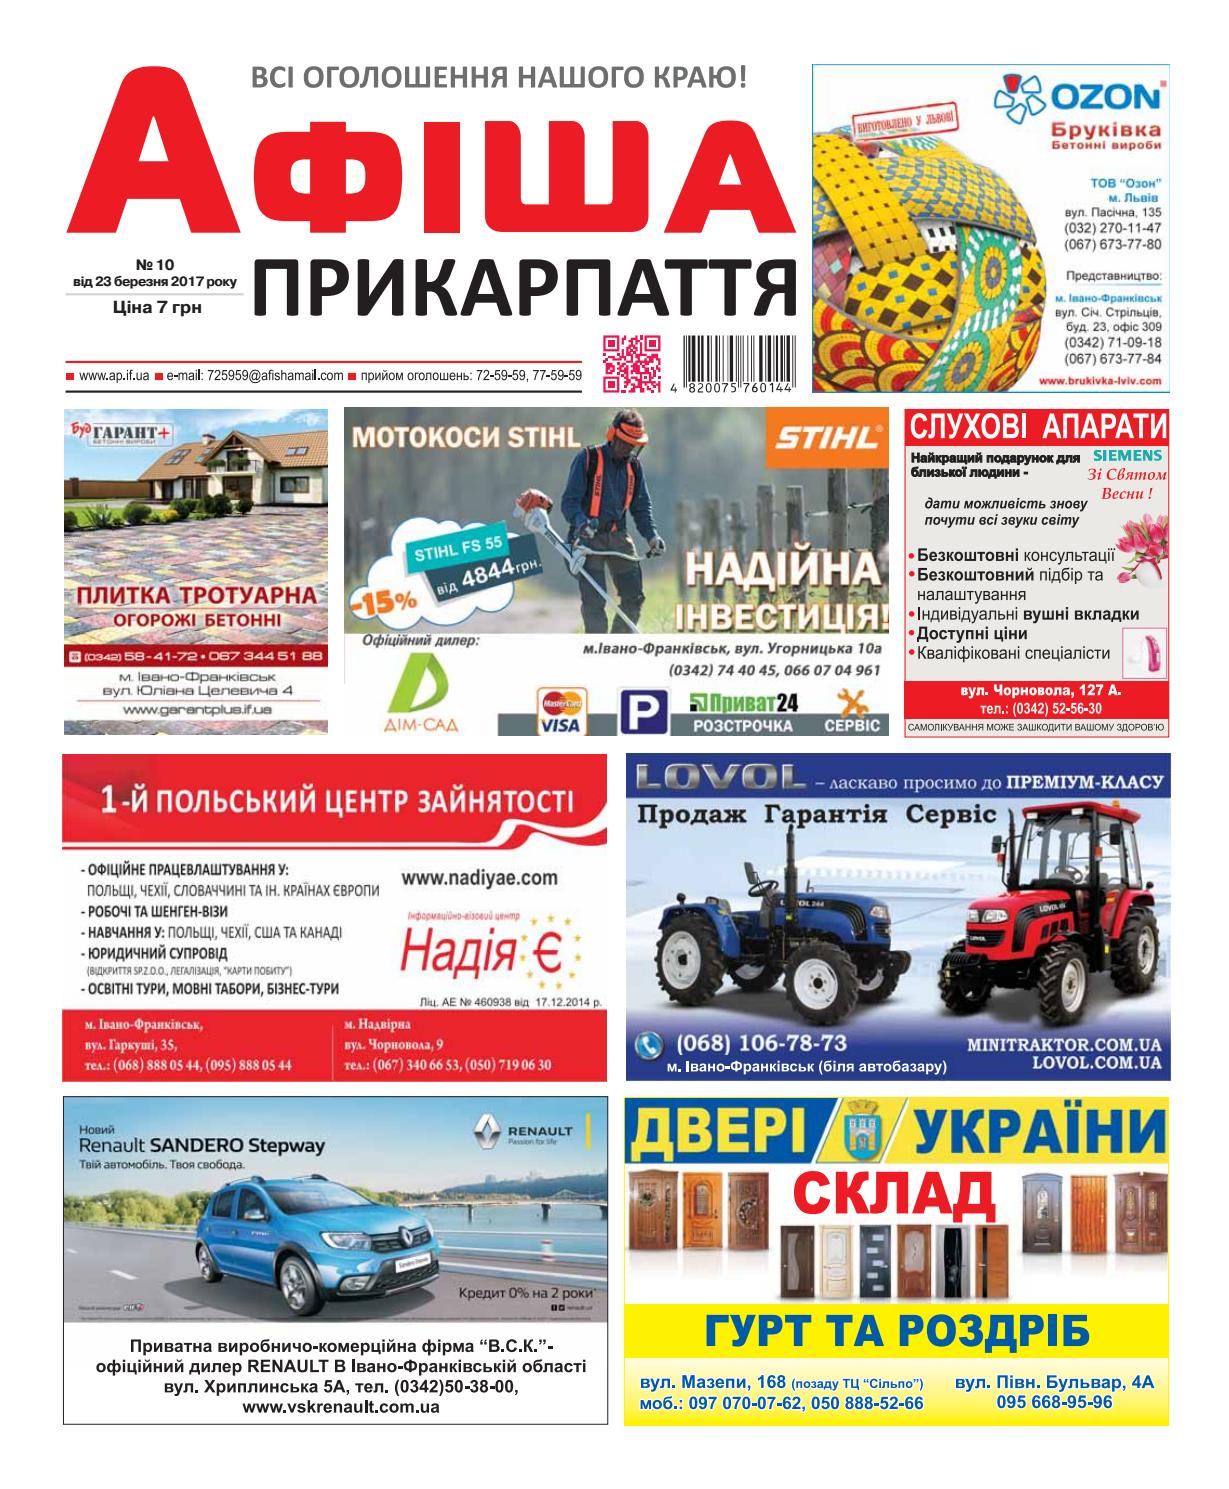 Афіша Прикапаття 10 by Olya Olya - issuu 6dc1aeee77998